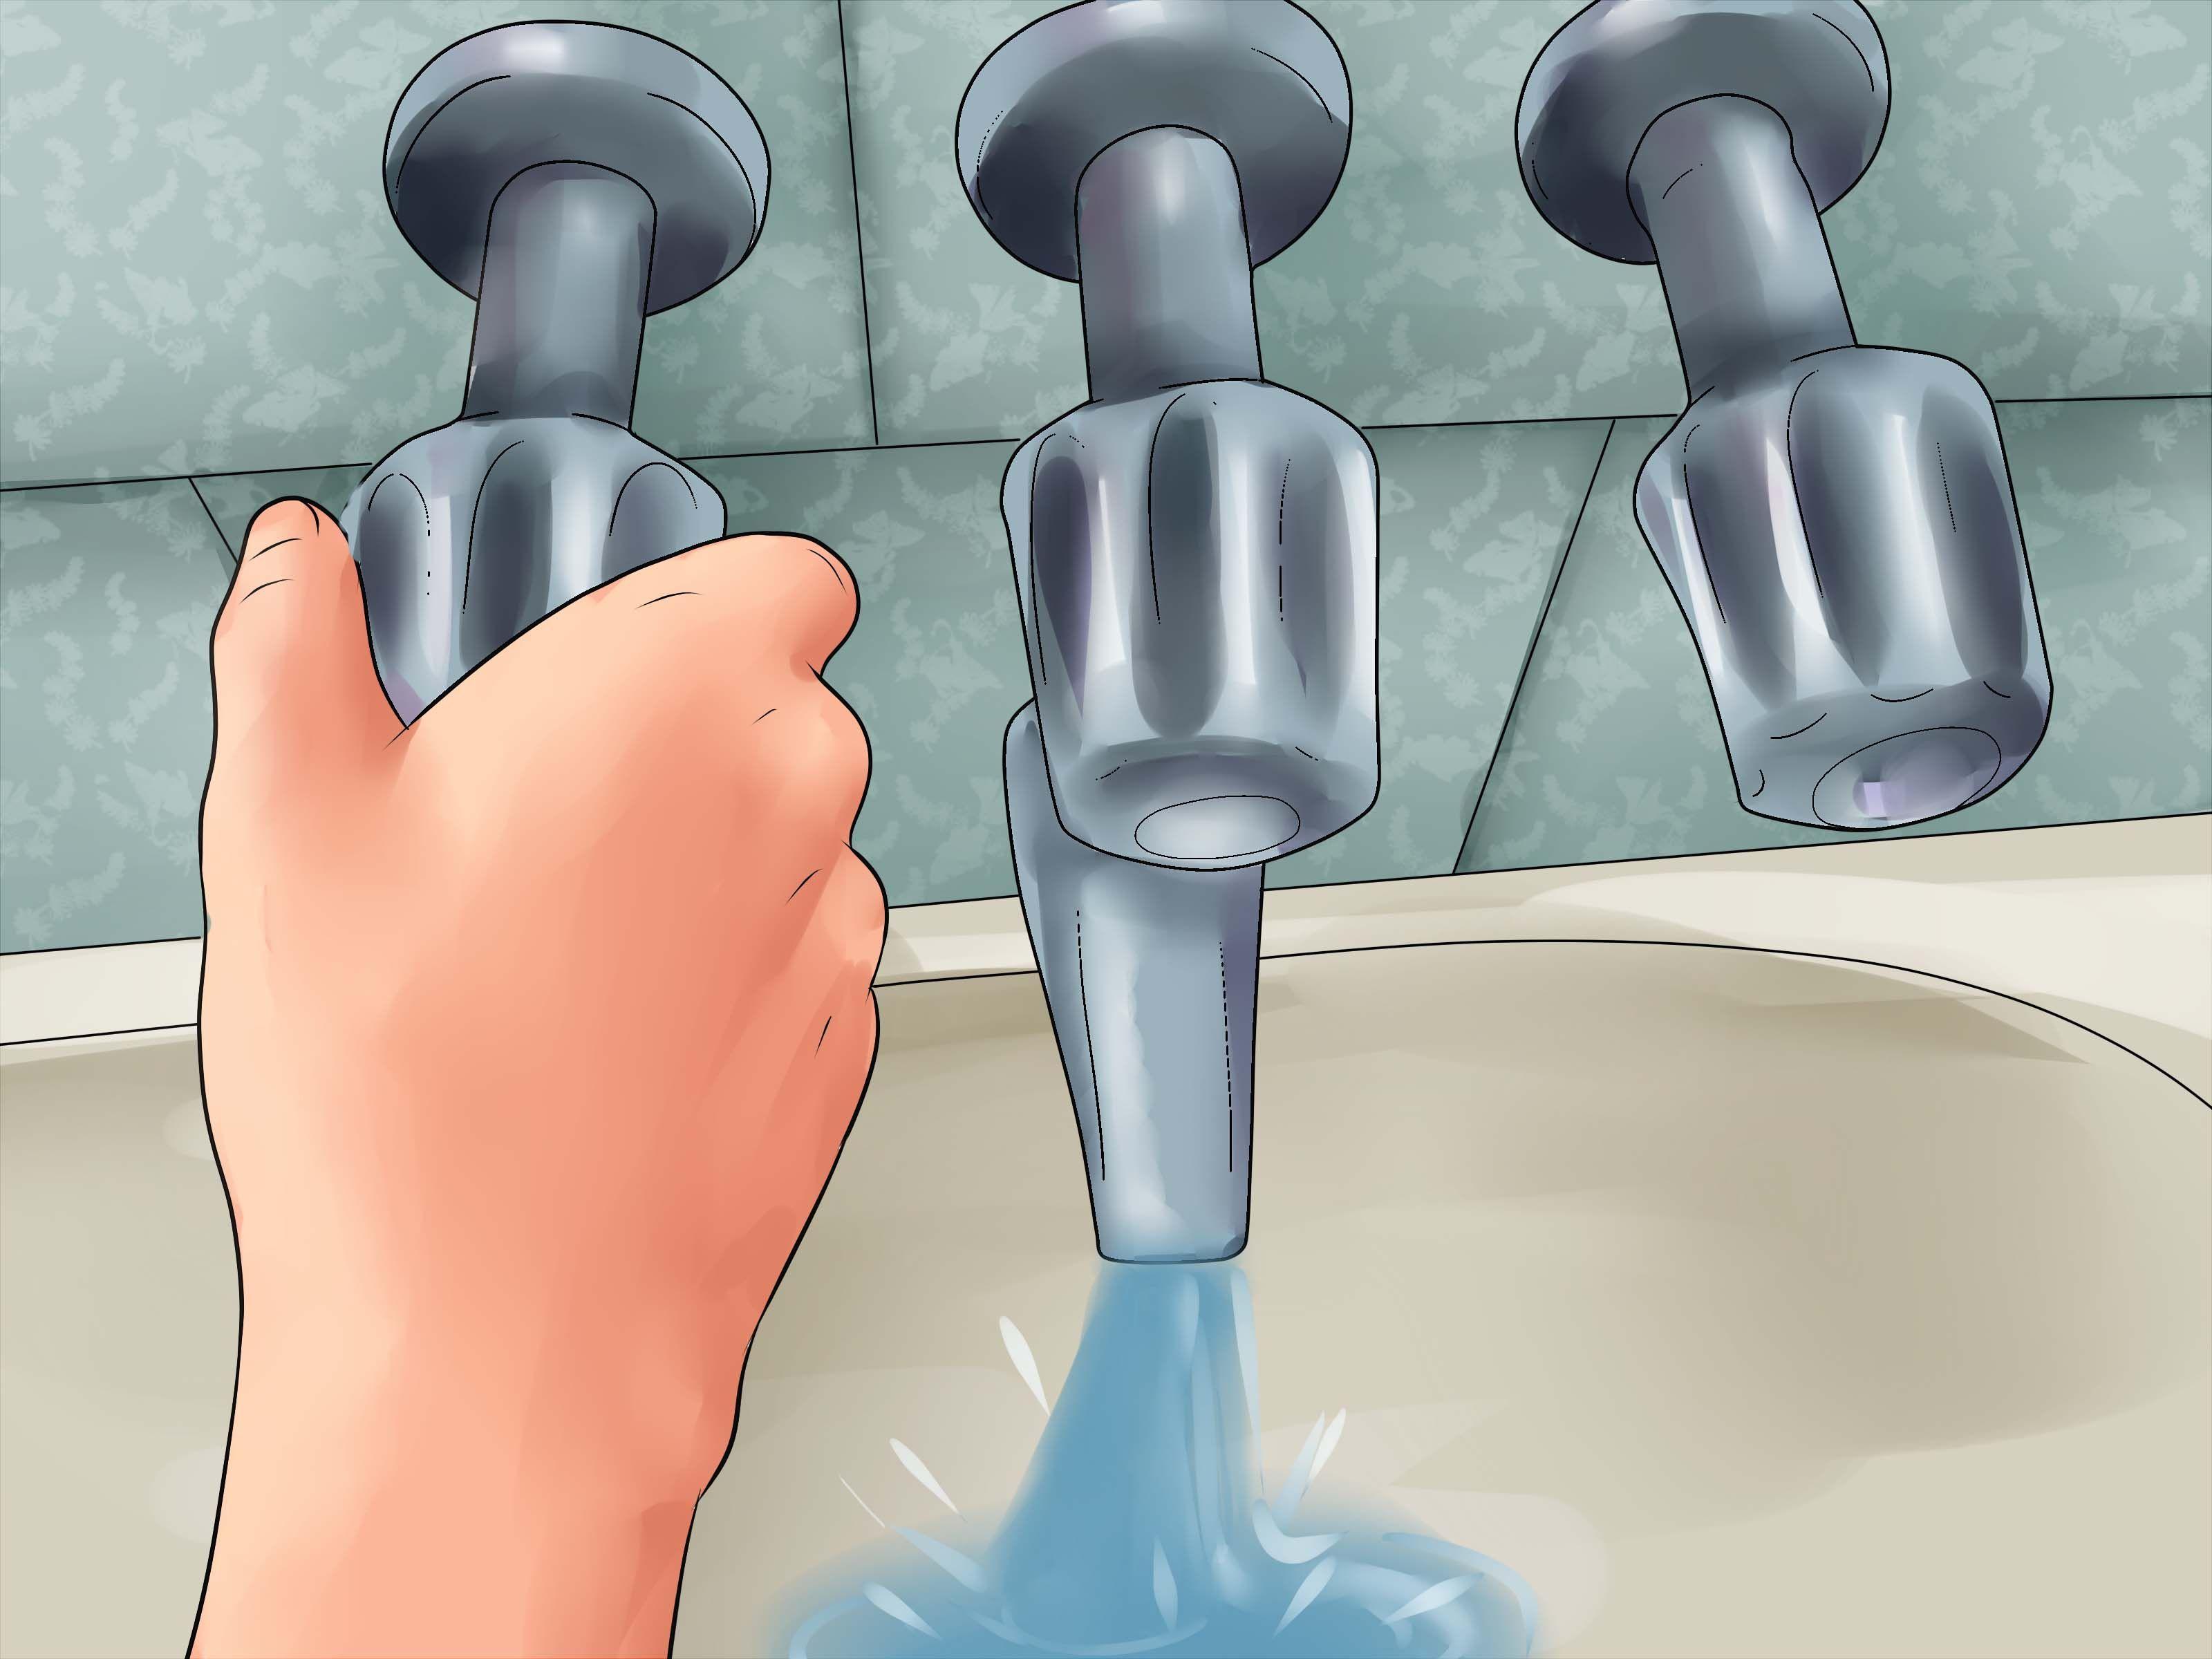 How To Change A Bathtub Faucet Bathroom Faucets Bathtub Faucet